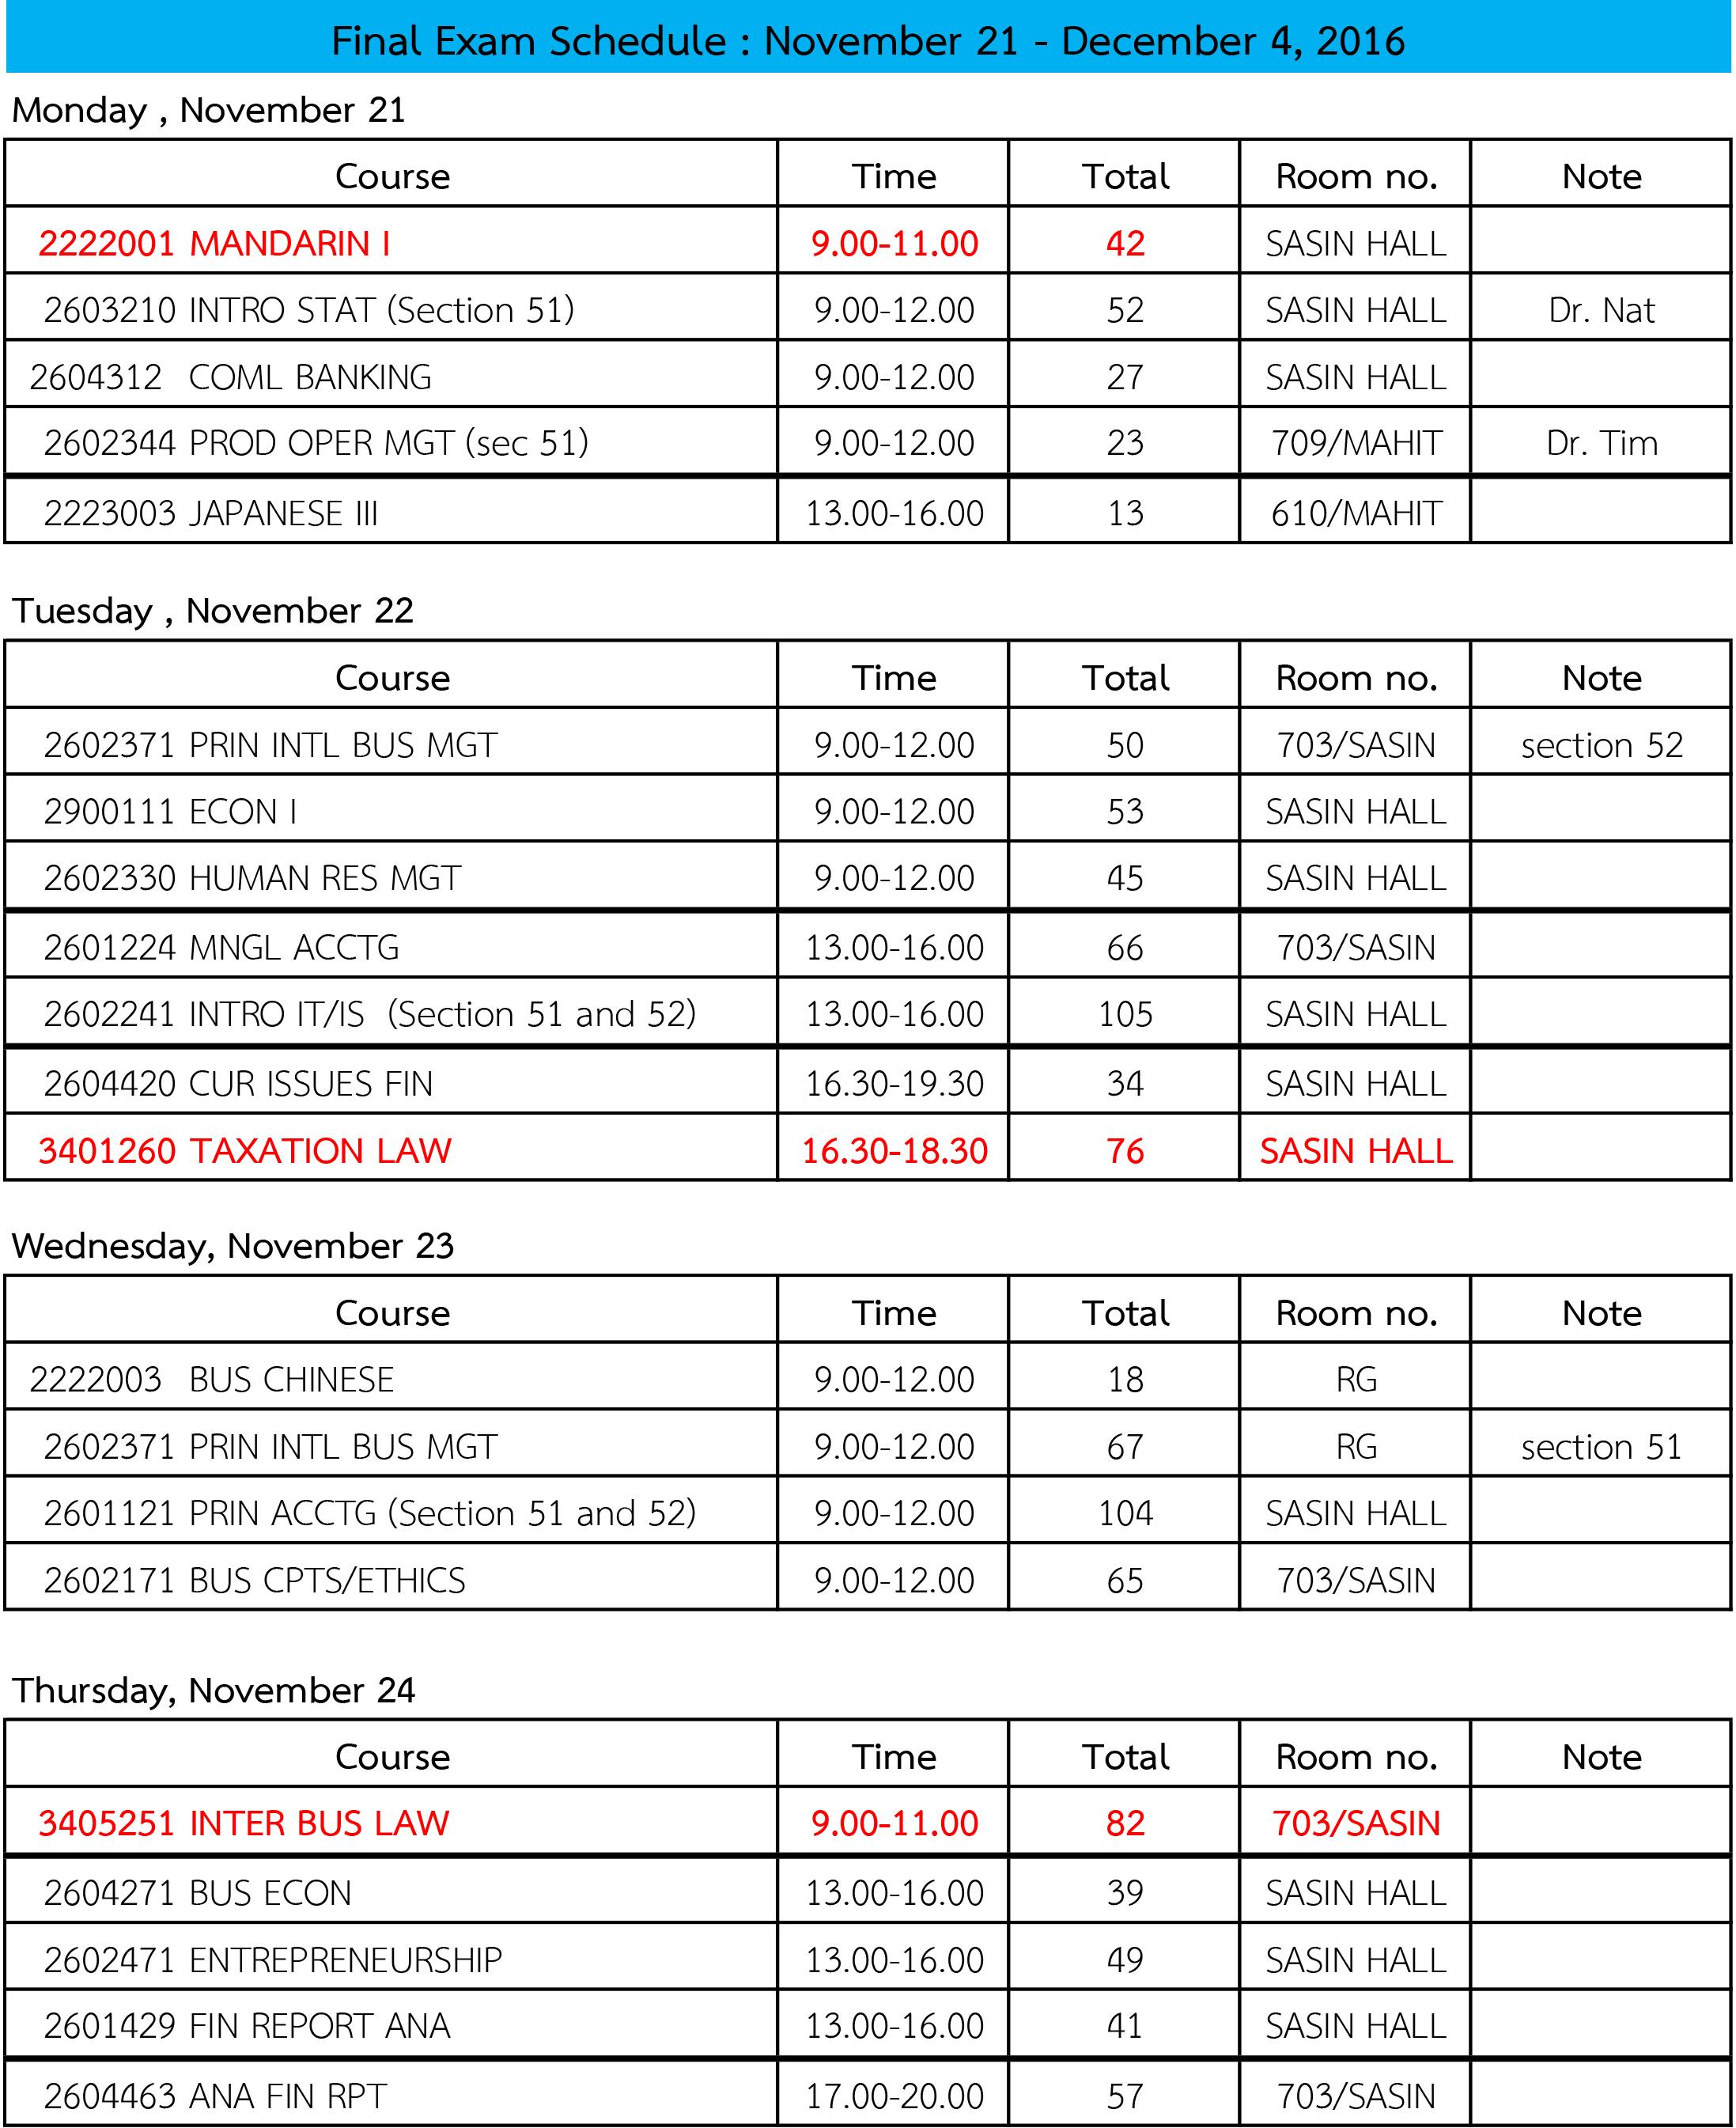 Final Exam Schedule on November 21 - December 4, 2016_(